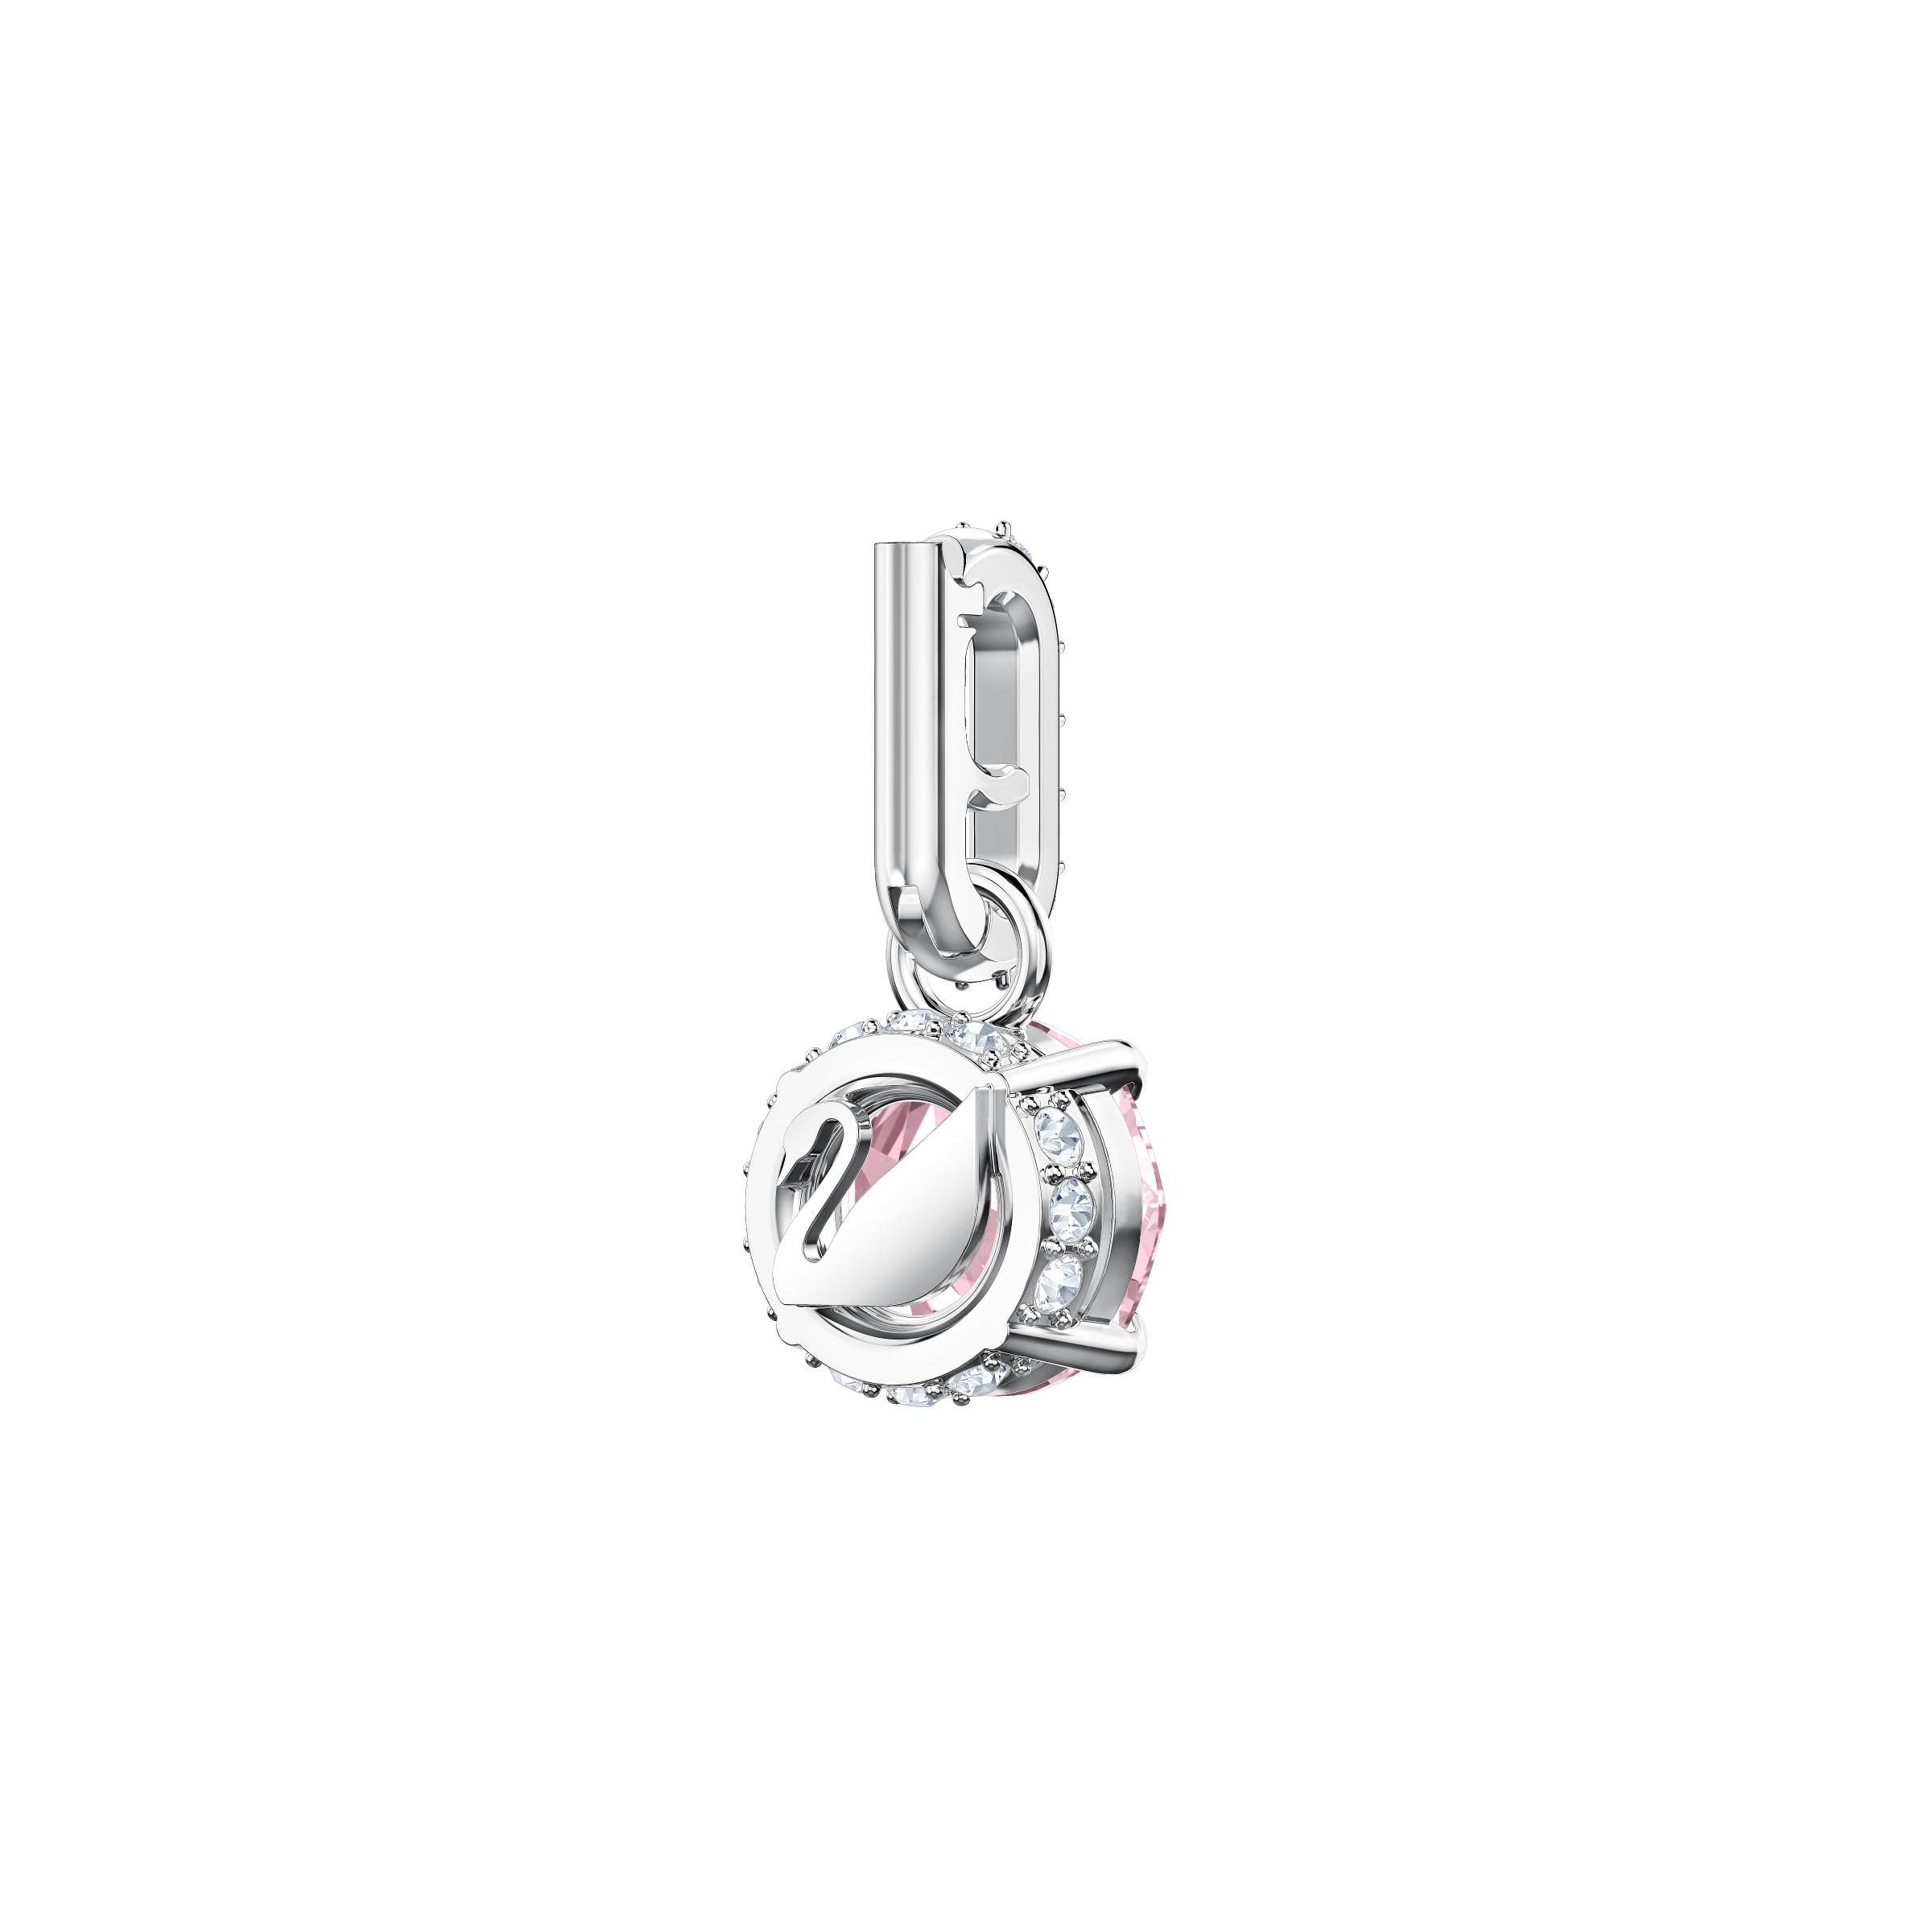 Swarovski Remix Collection Charm, October, Pink, Rhodium Plating